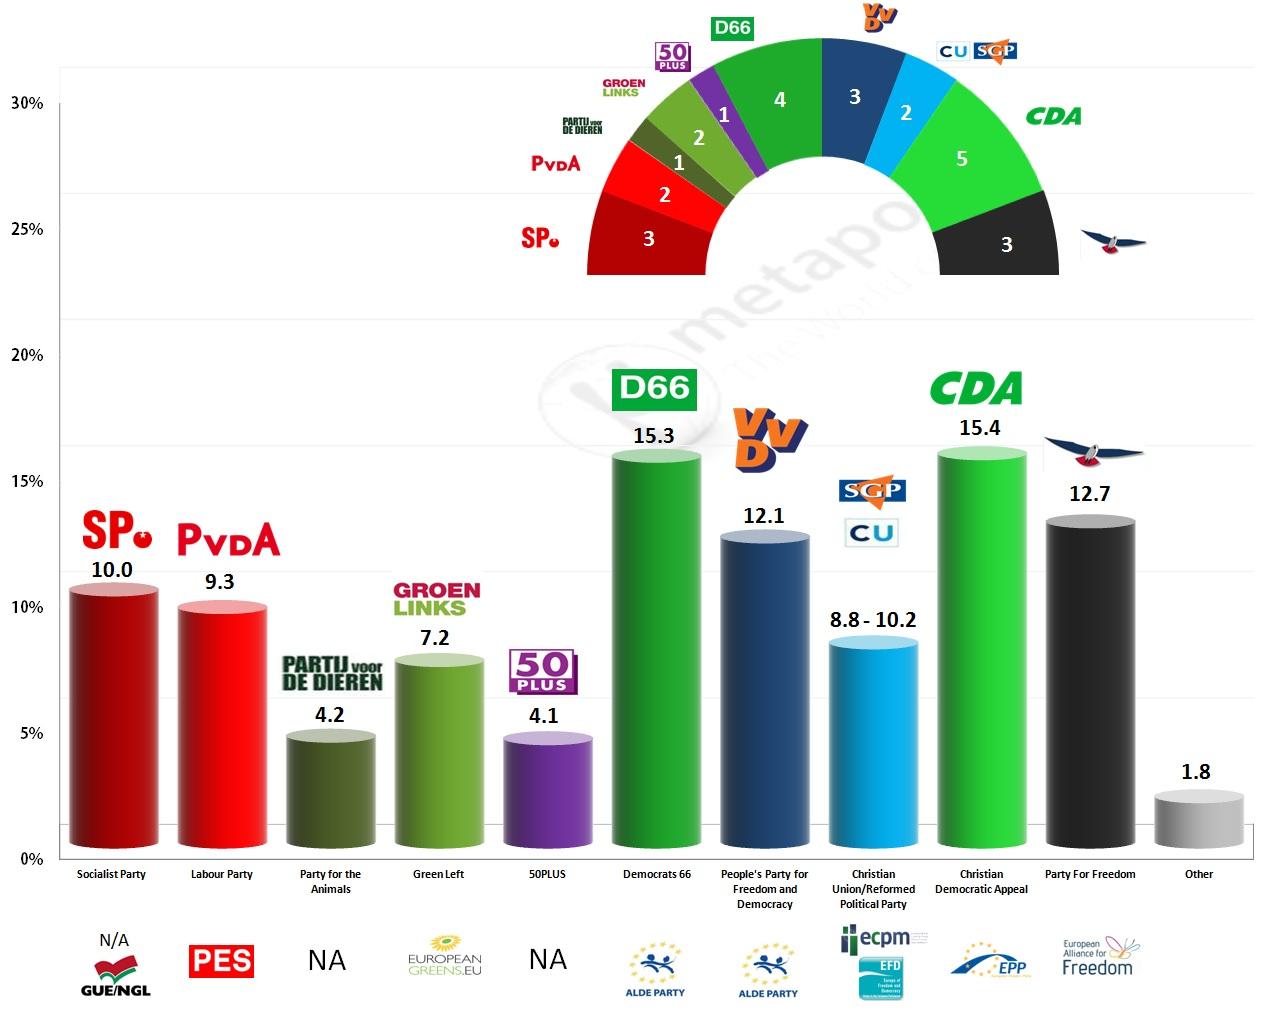 2014 Election Exit Polls